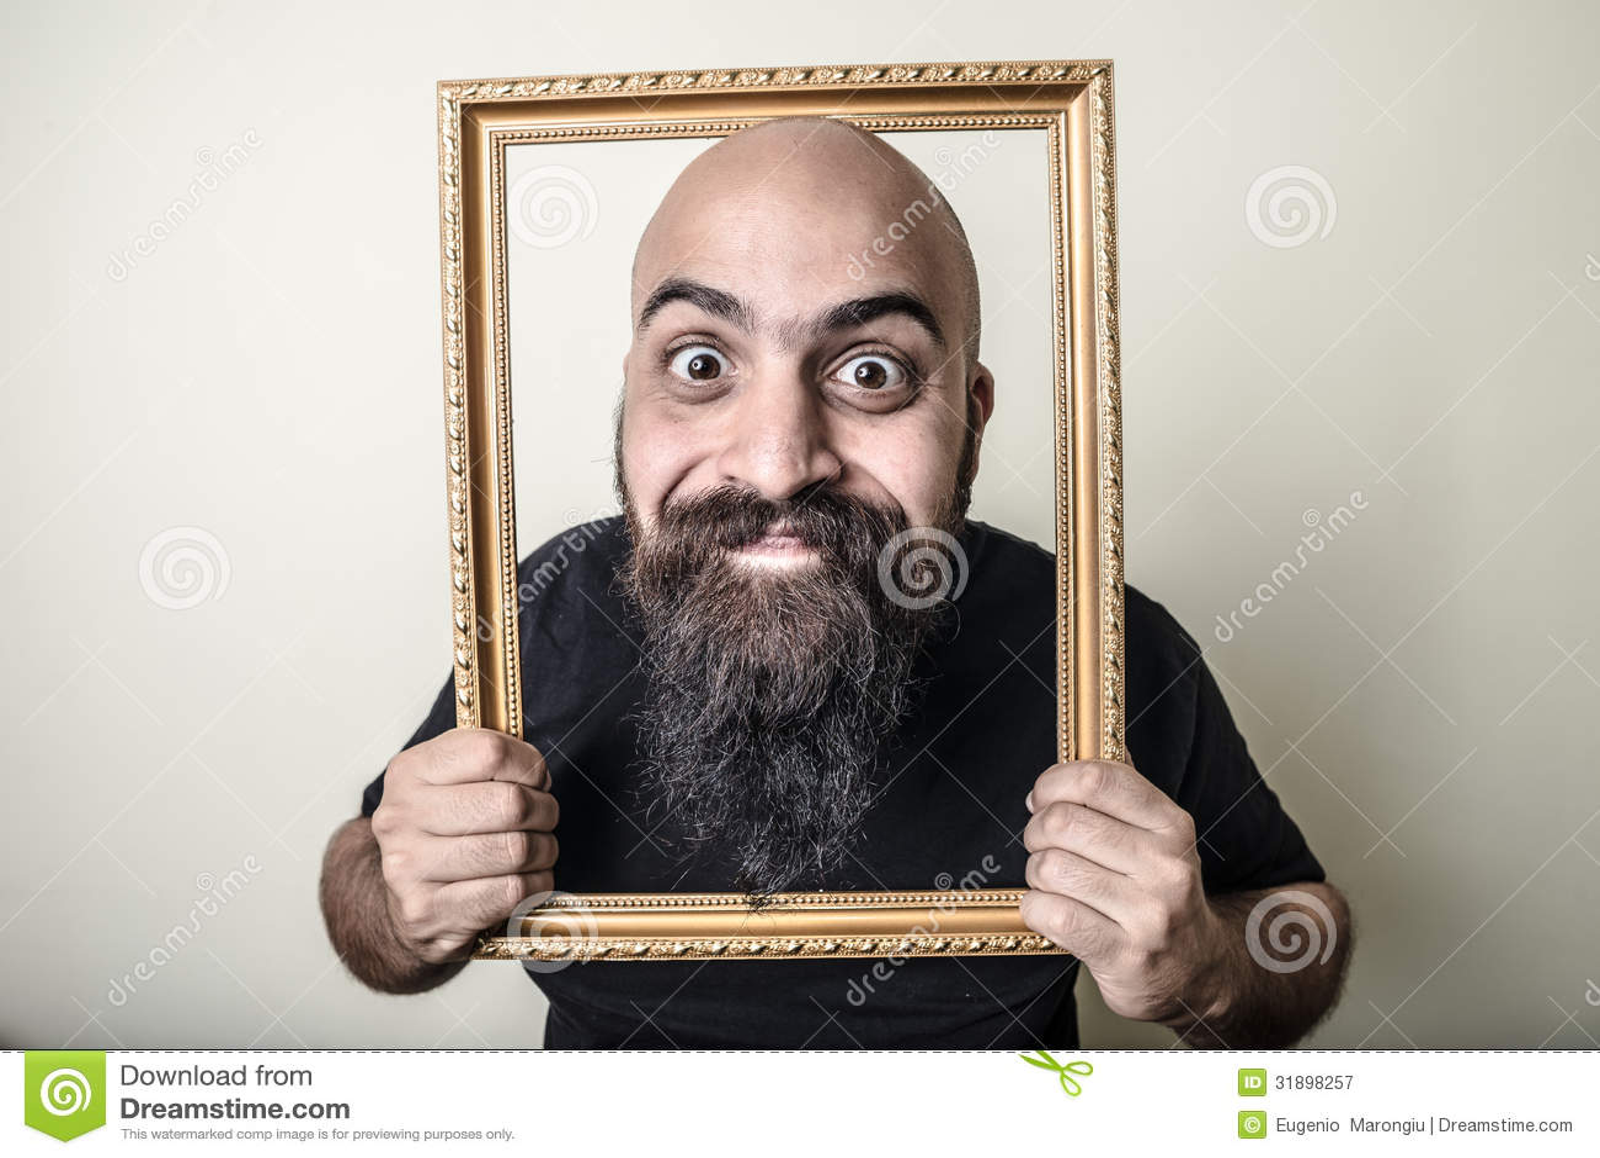 Wall Art Beard Responsibility Frame